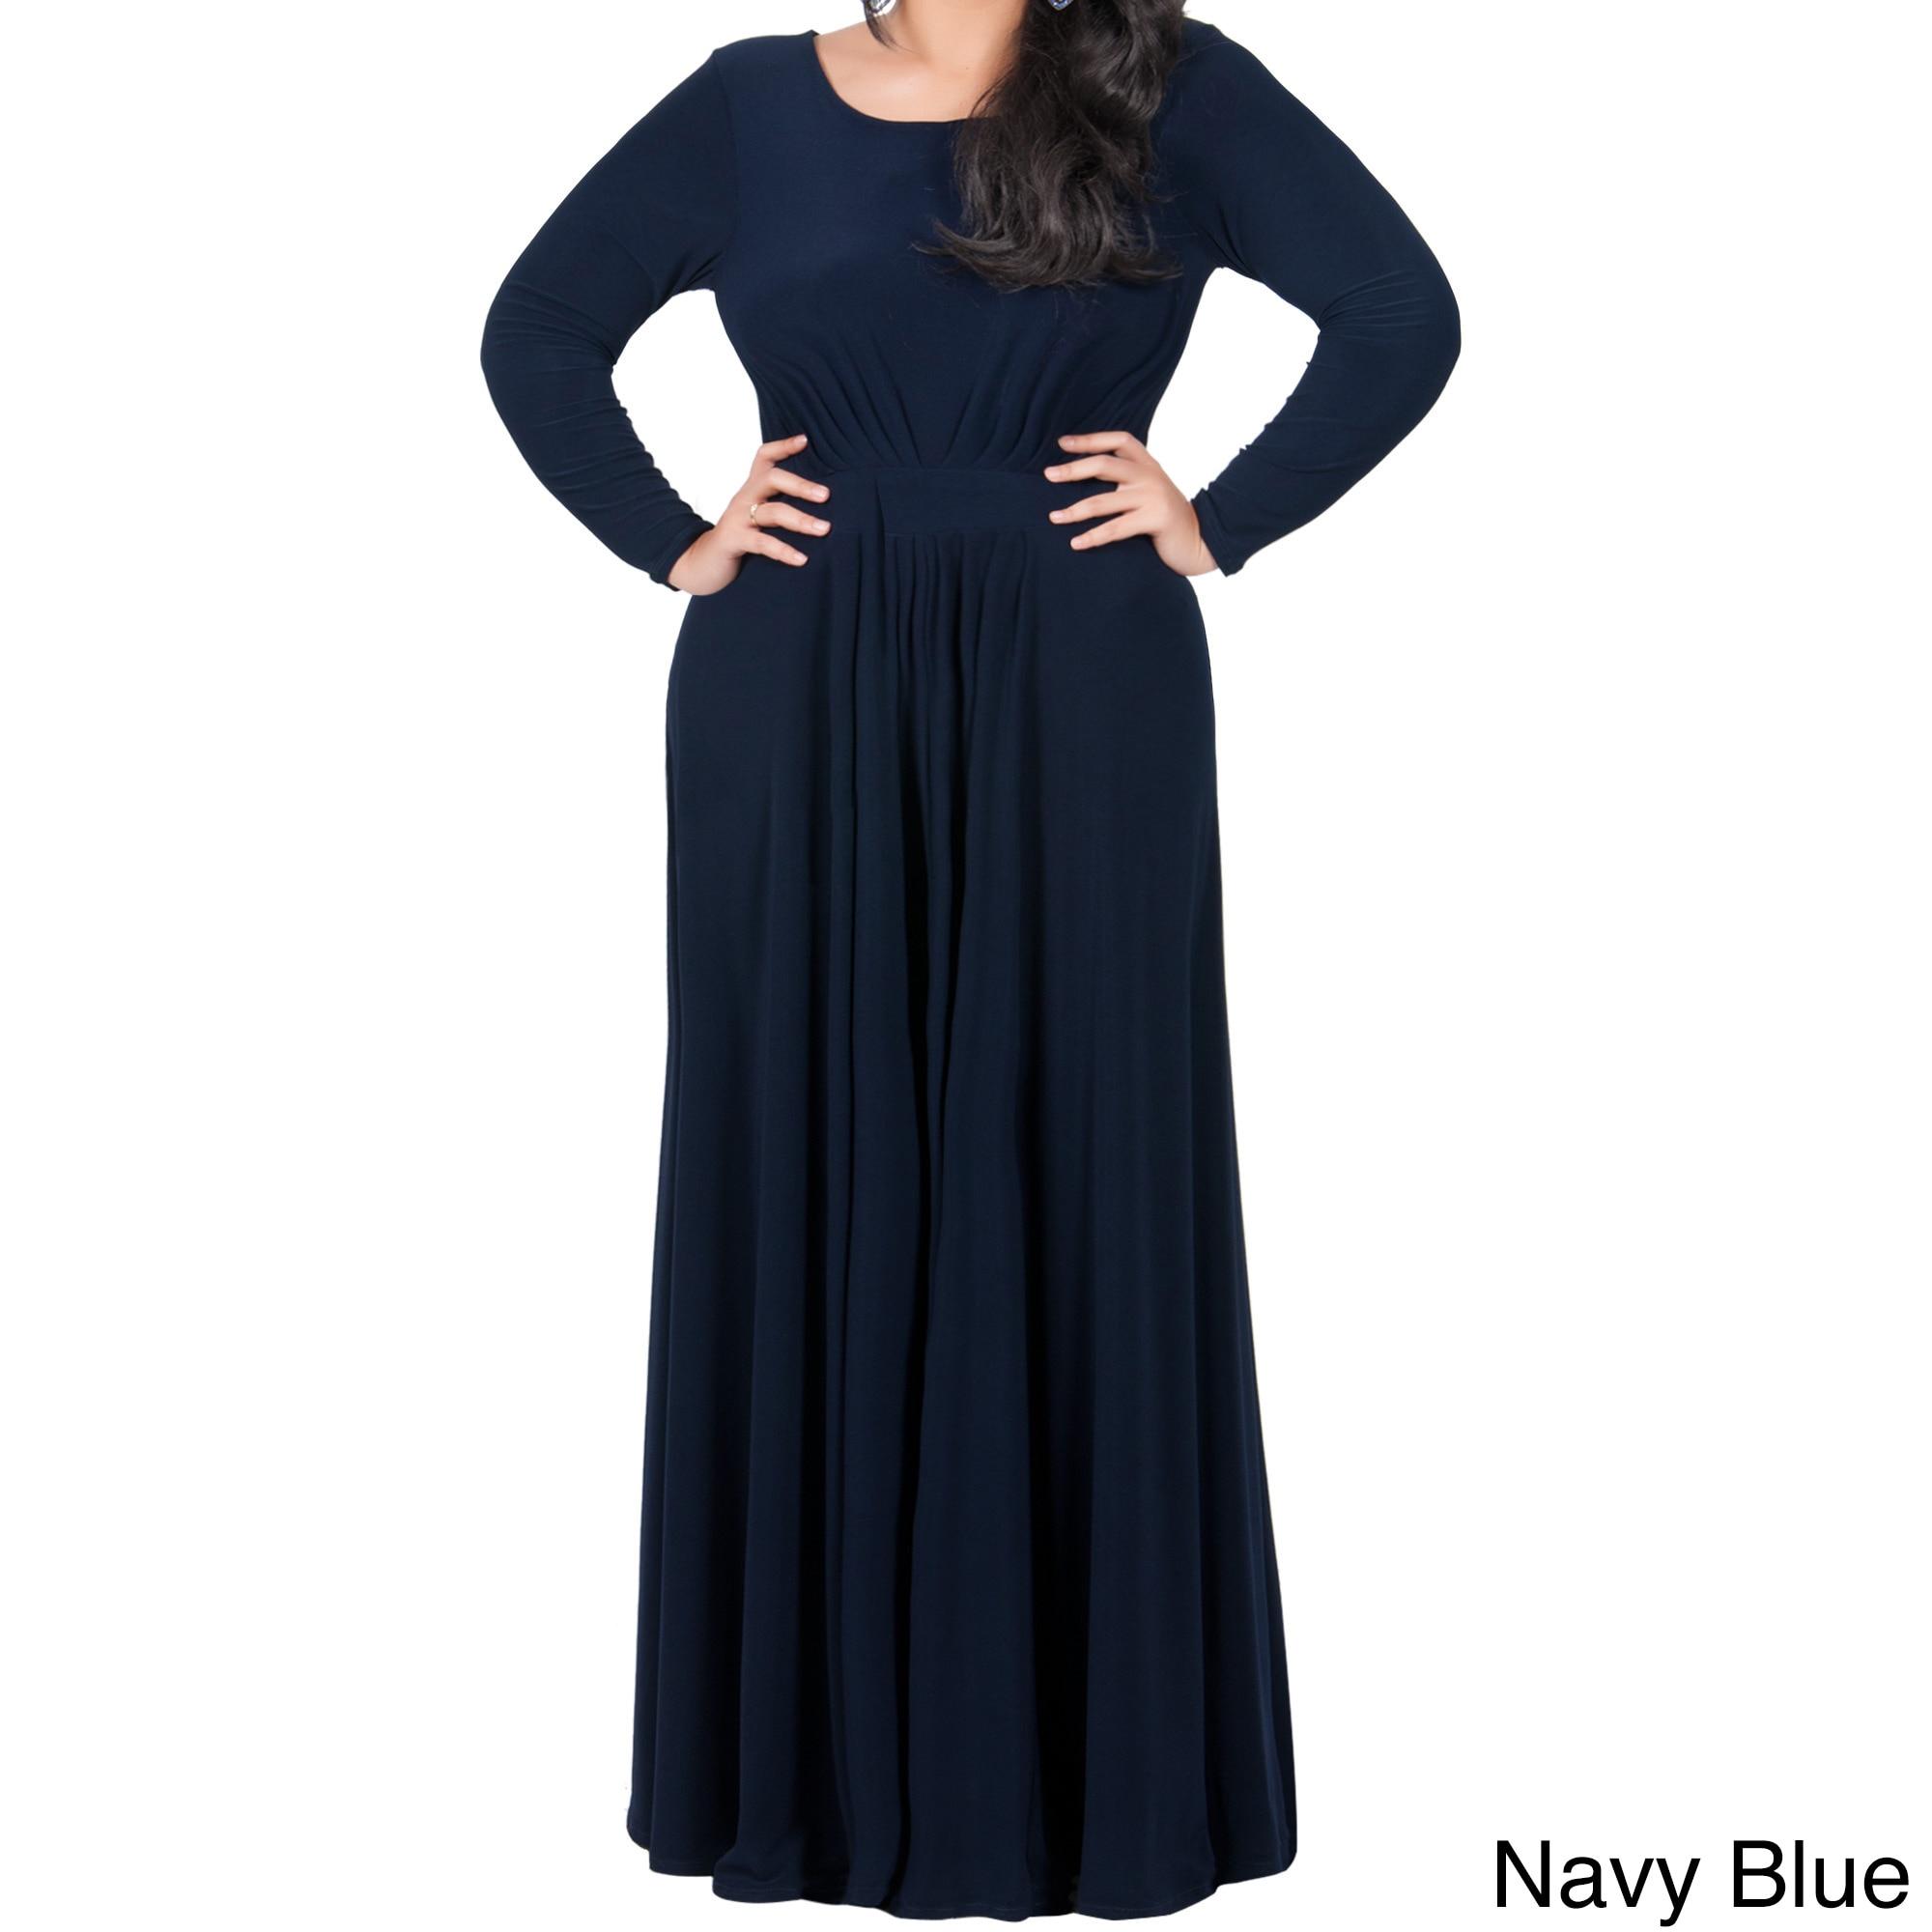 63adbcc322 KOH KOH Womens Plus Size Empire Waist Evening Maxi Dress